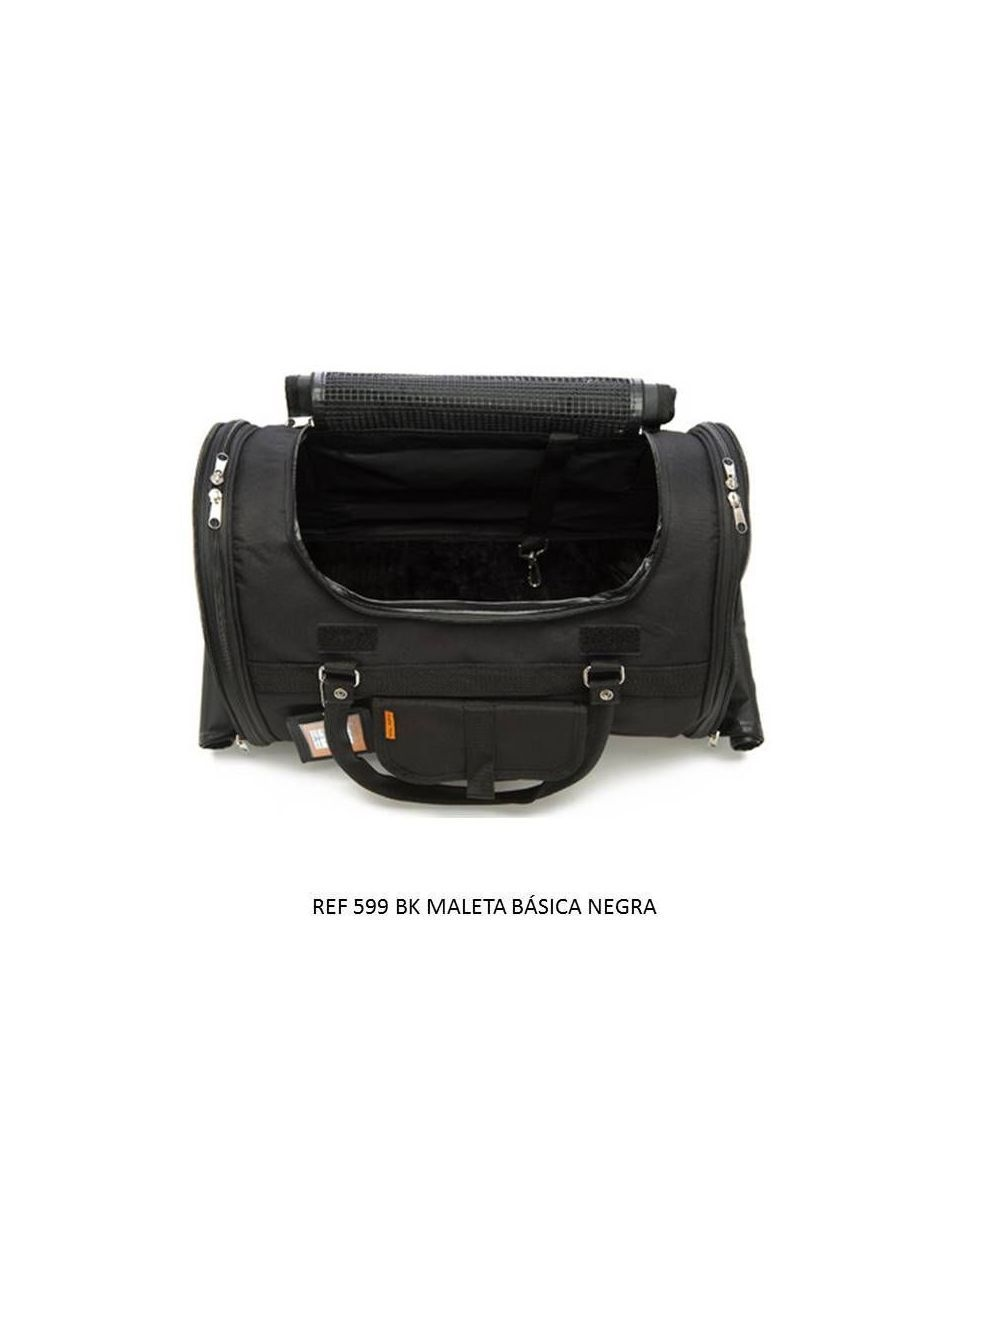 Maletin Porta-Mascotas Versatil Negro